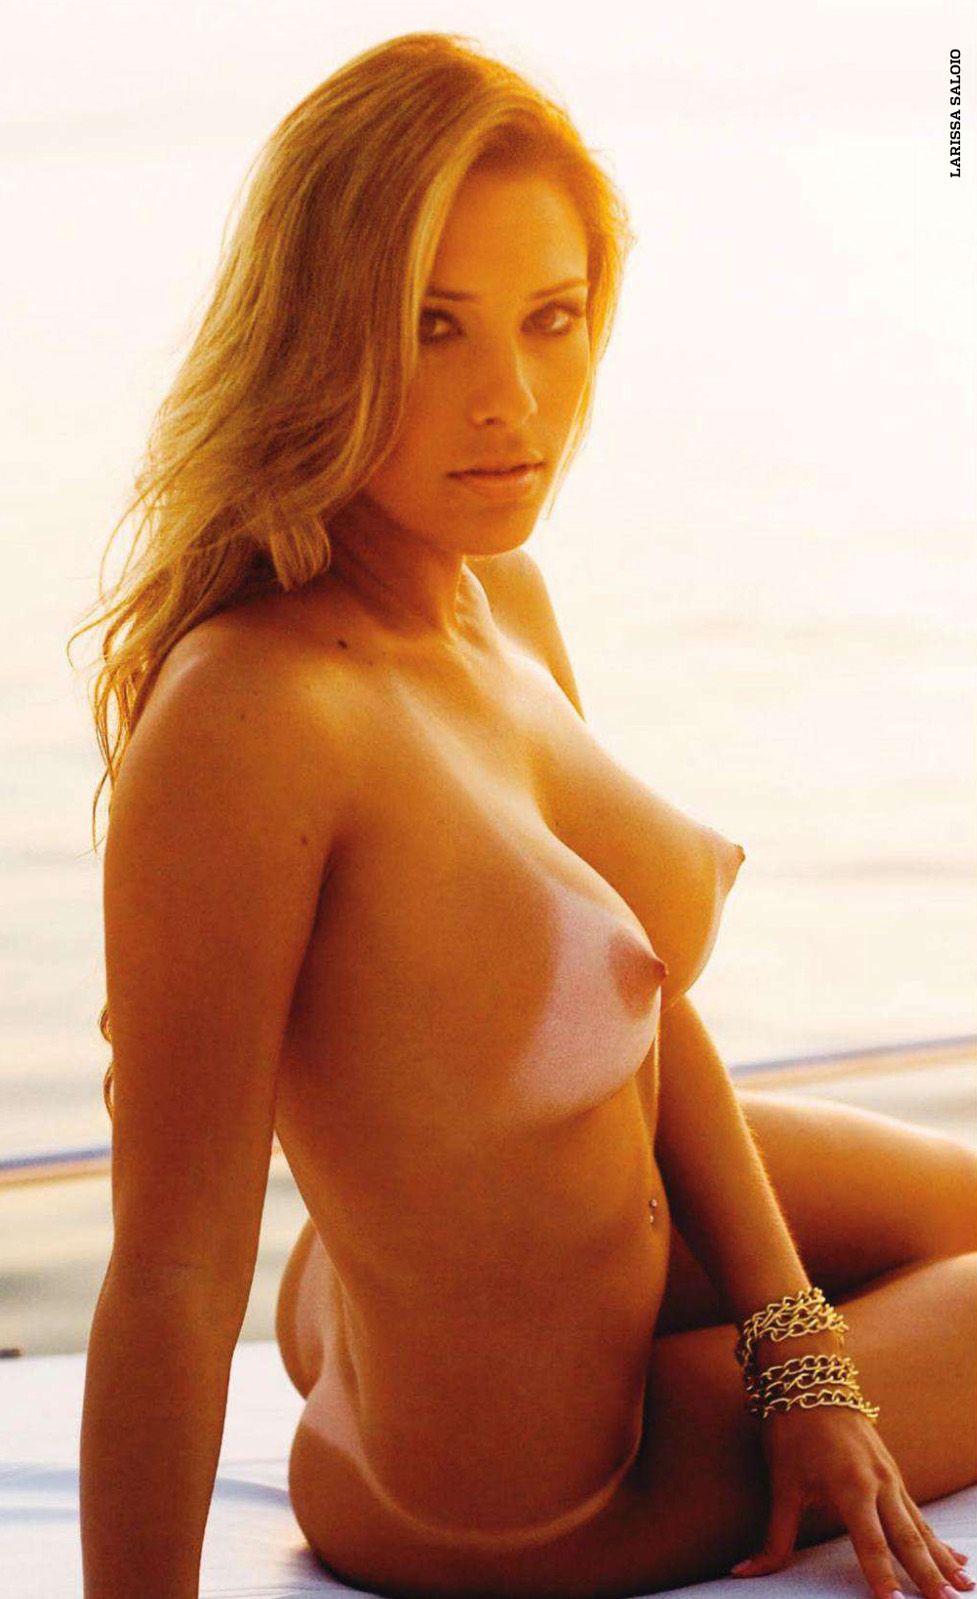 бразильские девушки / Especial Brasilenas in Playboy Spain january 2011 - Larissa Saloio